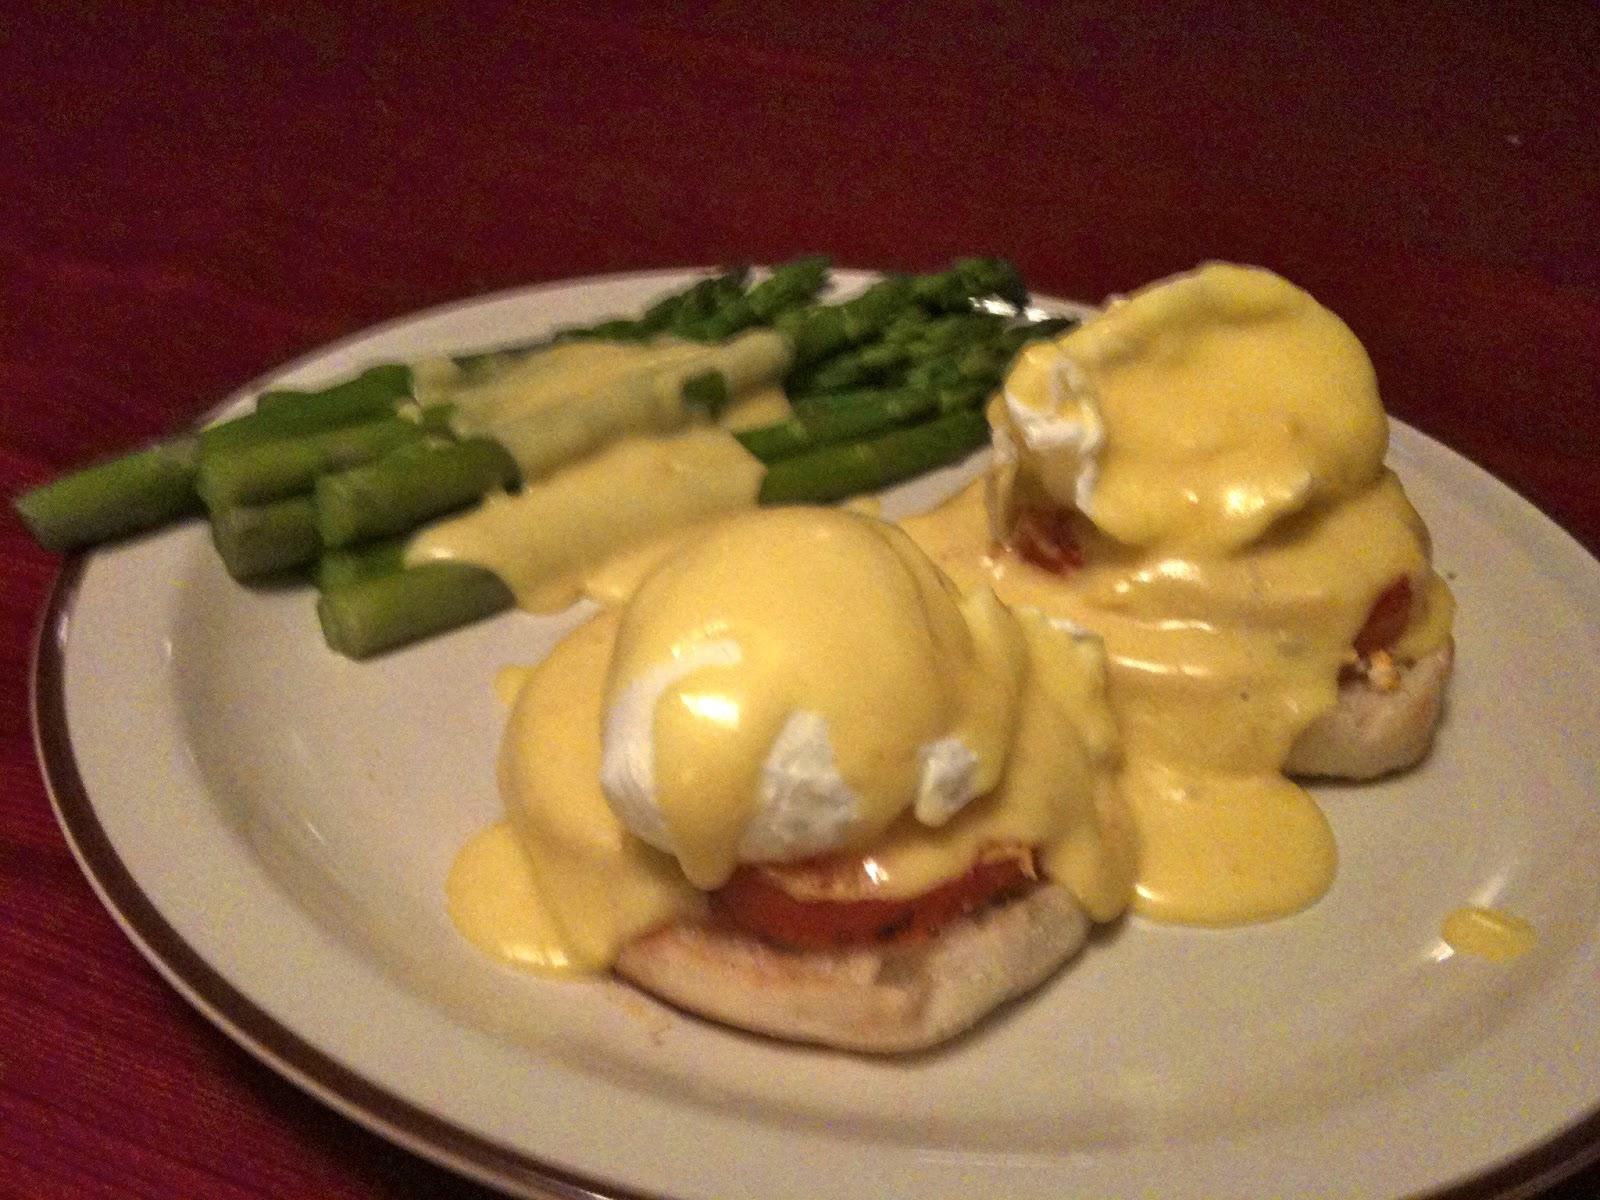 [Image: Eggs+benedict.jpg]